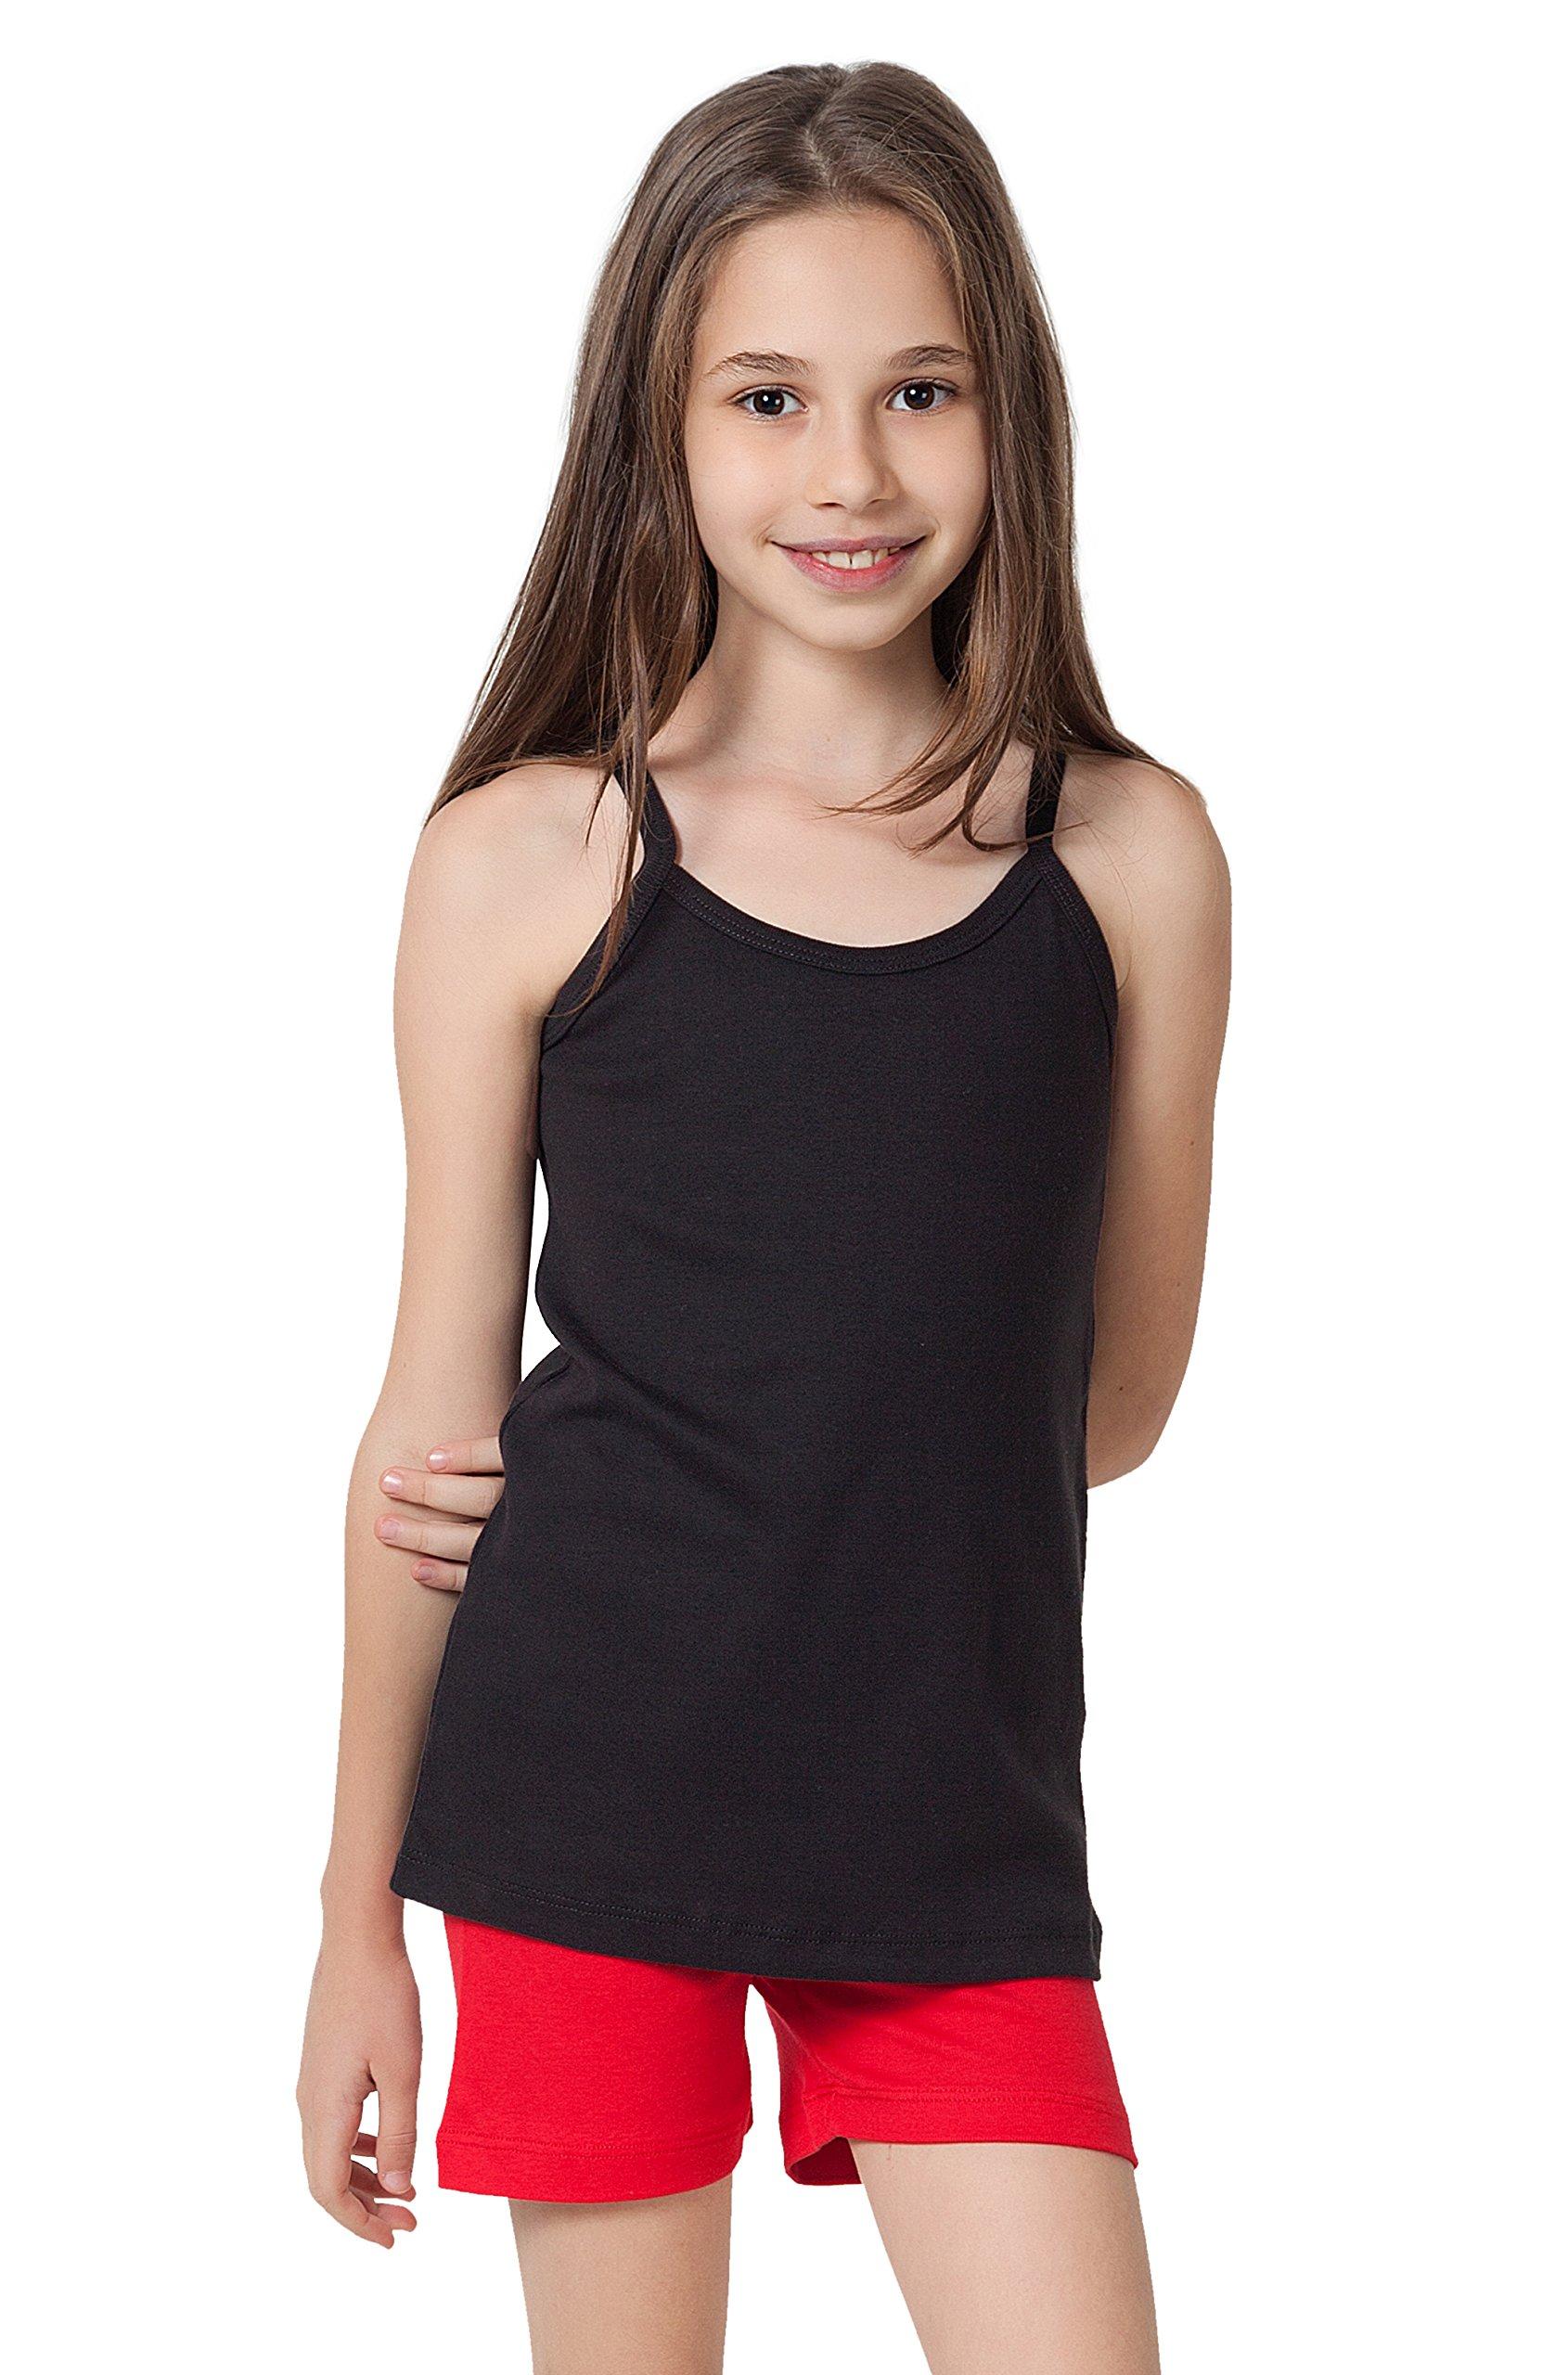 CAOMP Girls Camisole%100 Organic Cotton Undershirt Tank Tee Top (Pack of 2) (9-10, Black-White)